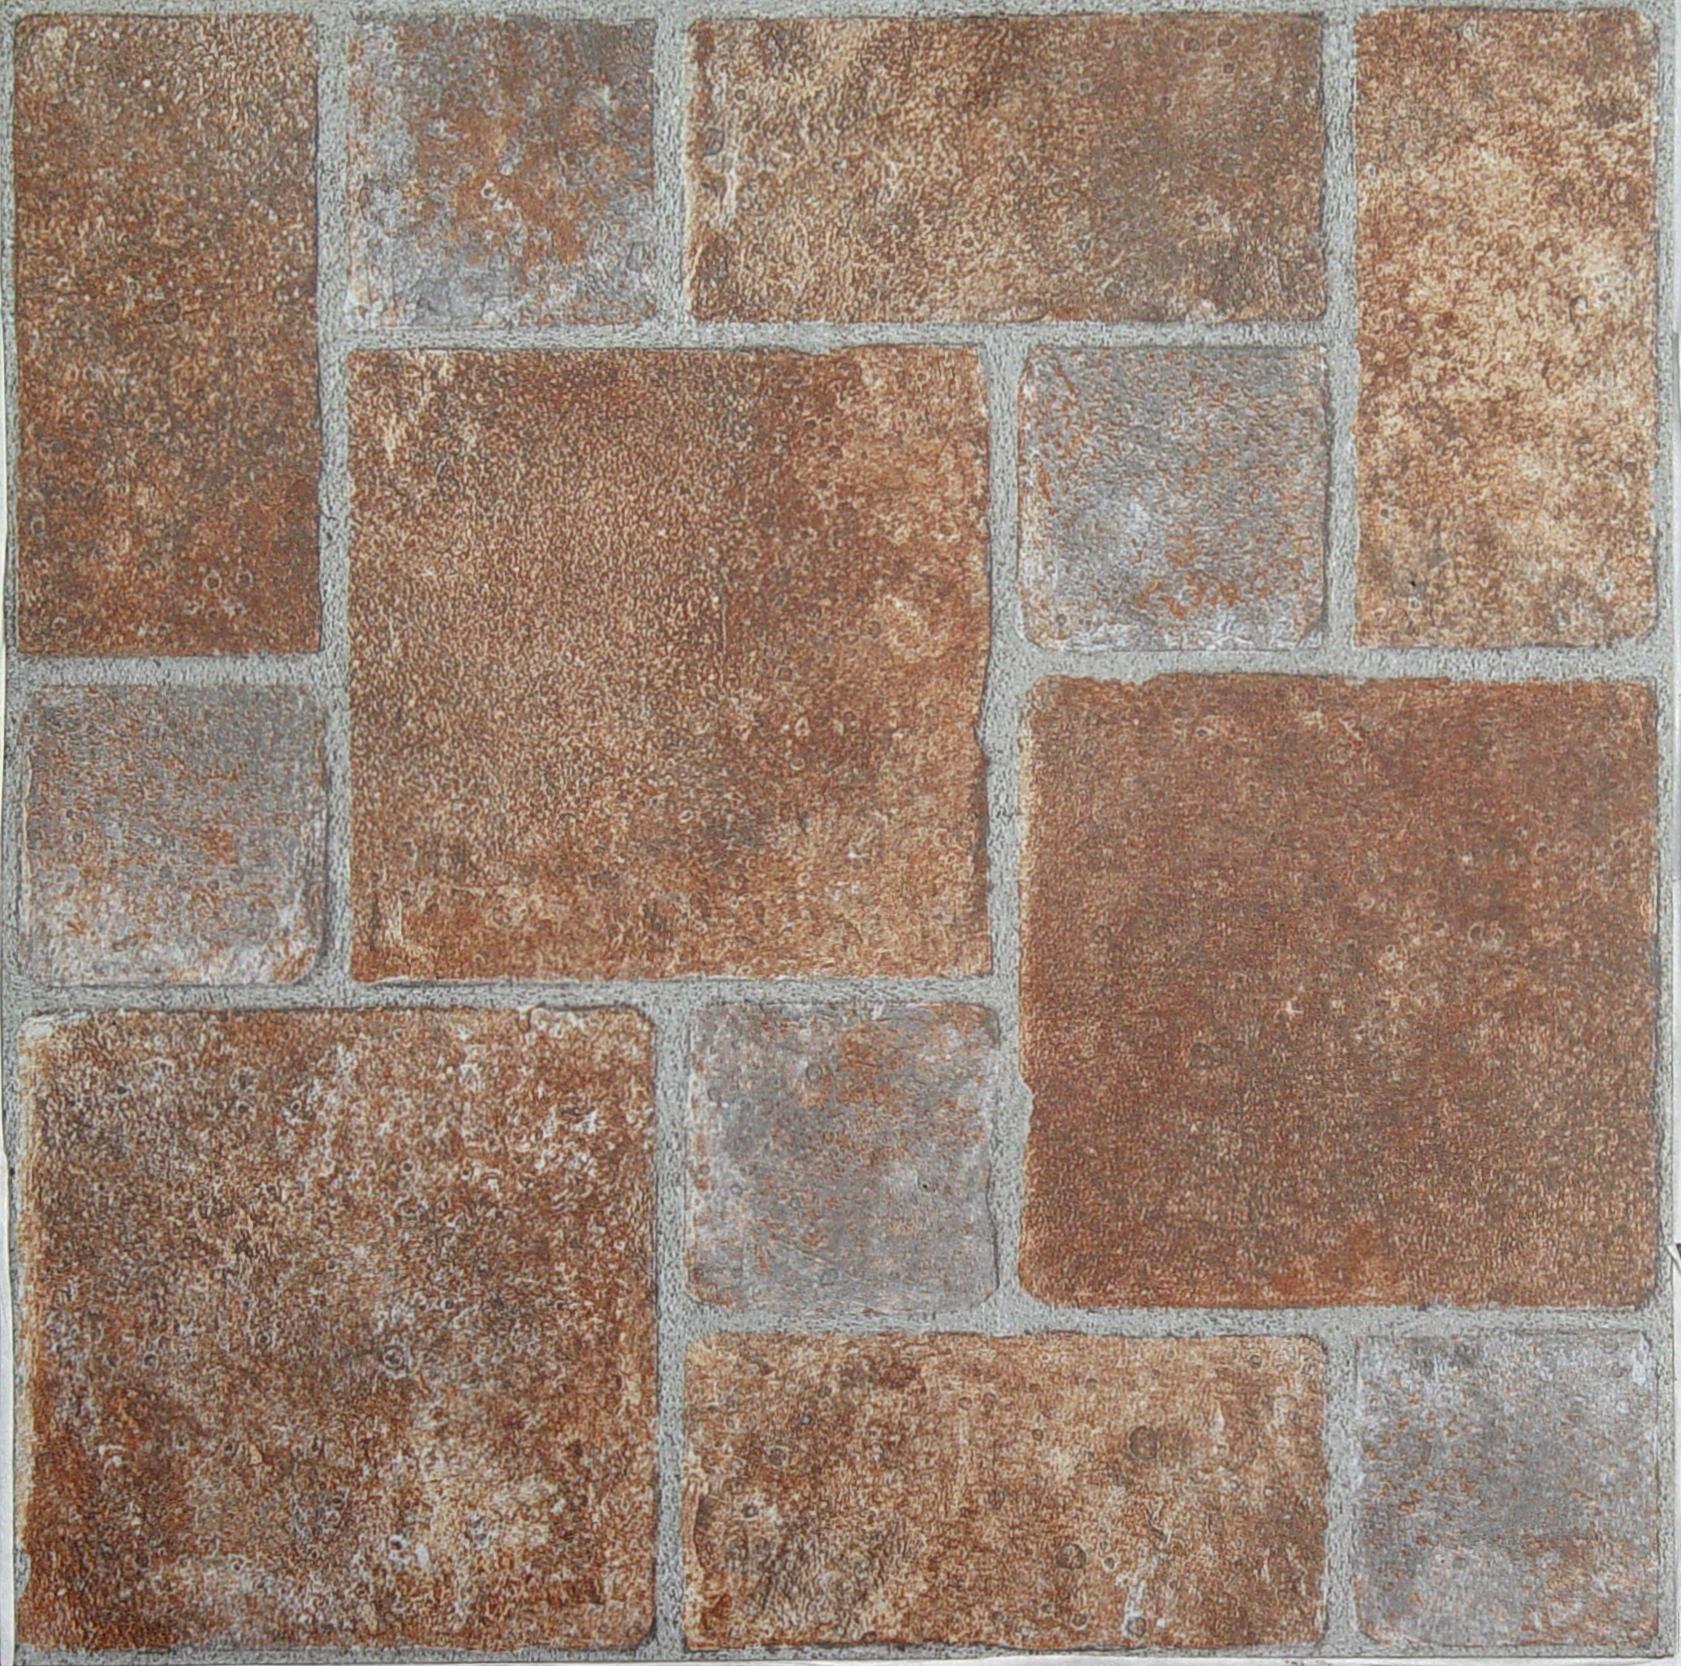 Achim nexus brick pavers 12 inch x 12 inch self adhesive vinyl floor achim nexus brick pavers 12 inch x 12 inch self adhesive vinyl floor tile 332 dailygadgetfo Images